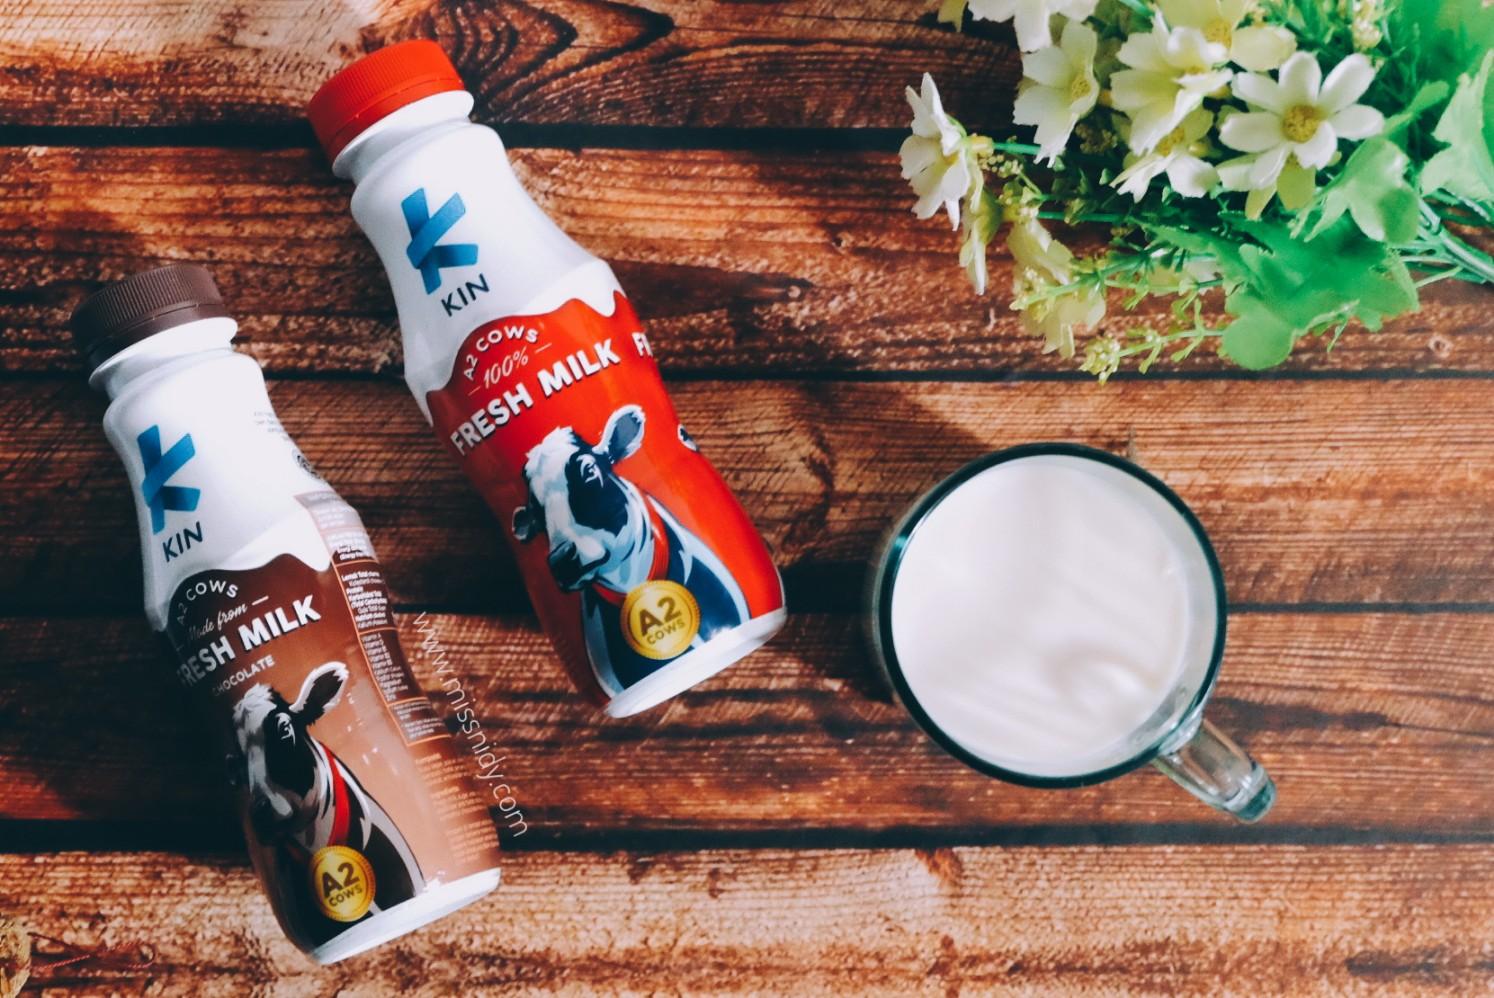 kin fresh milk susu mengandung protein a2